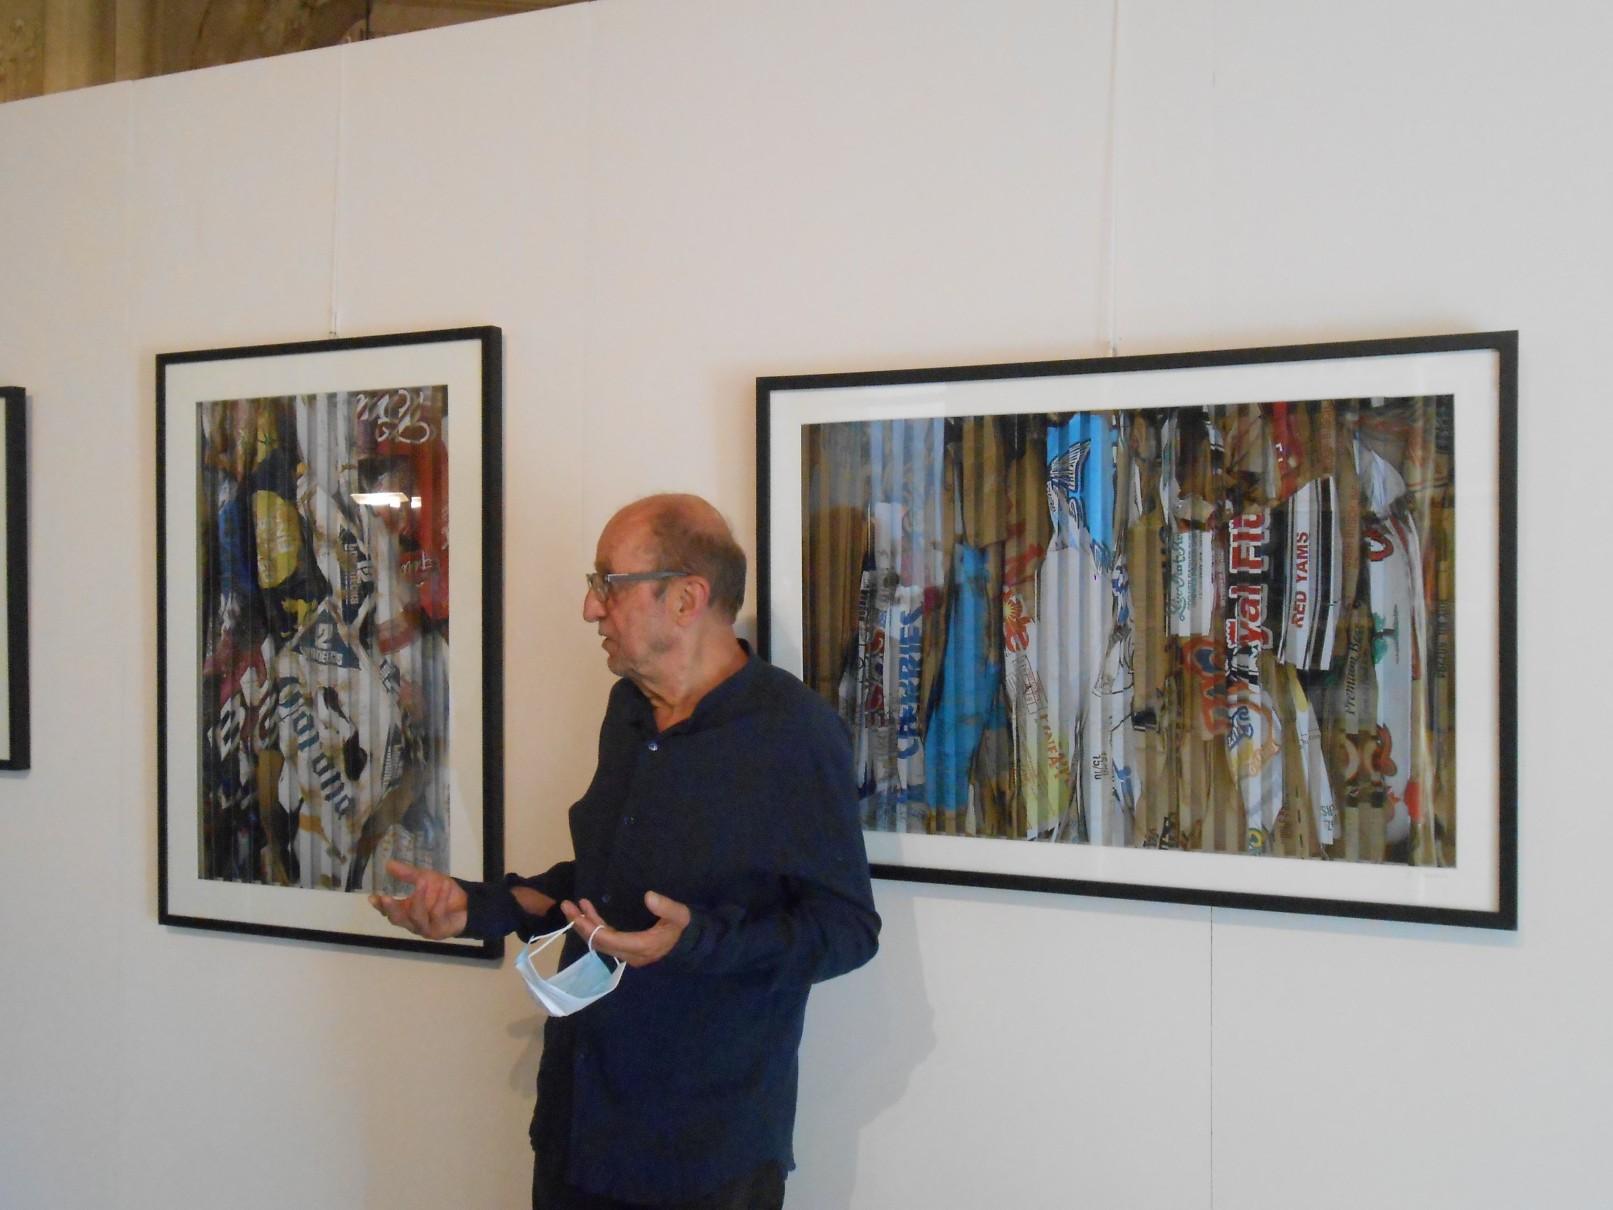 Jaques Renoir, mostra openartcode, palazzo Rosselli Del Turco, Firenze